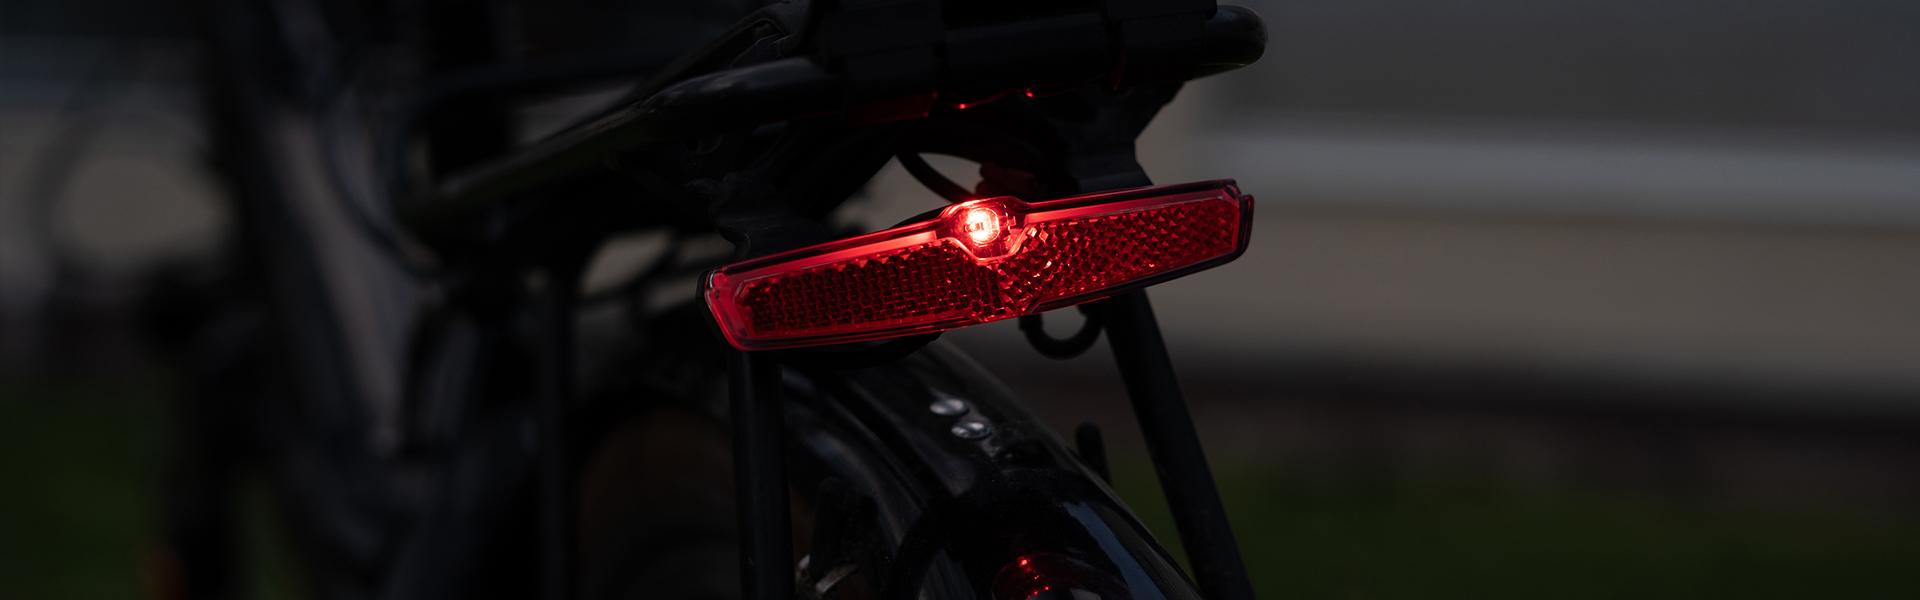 LF-01 Sate-lite StVZO rechargeable bike headlight/ bicycle light